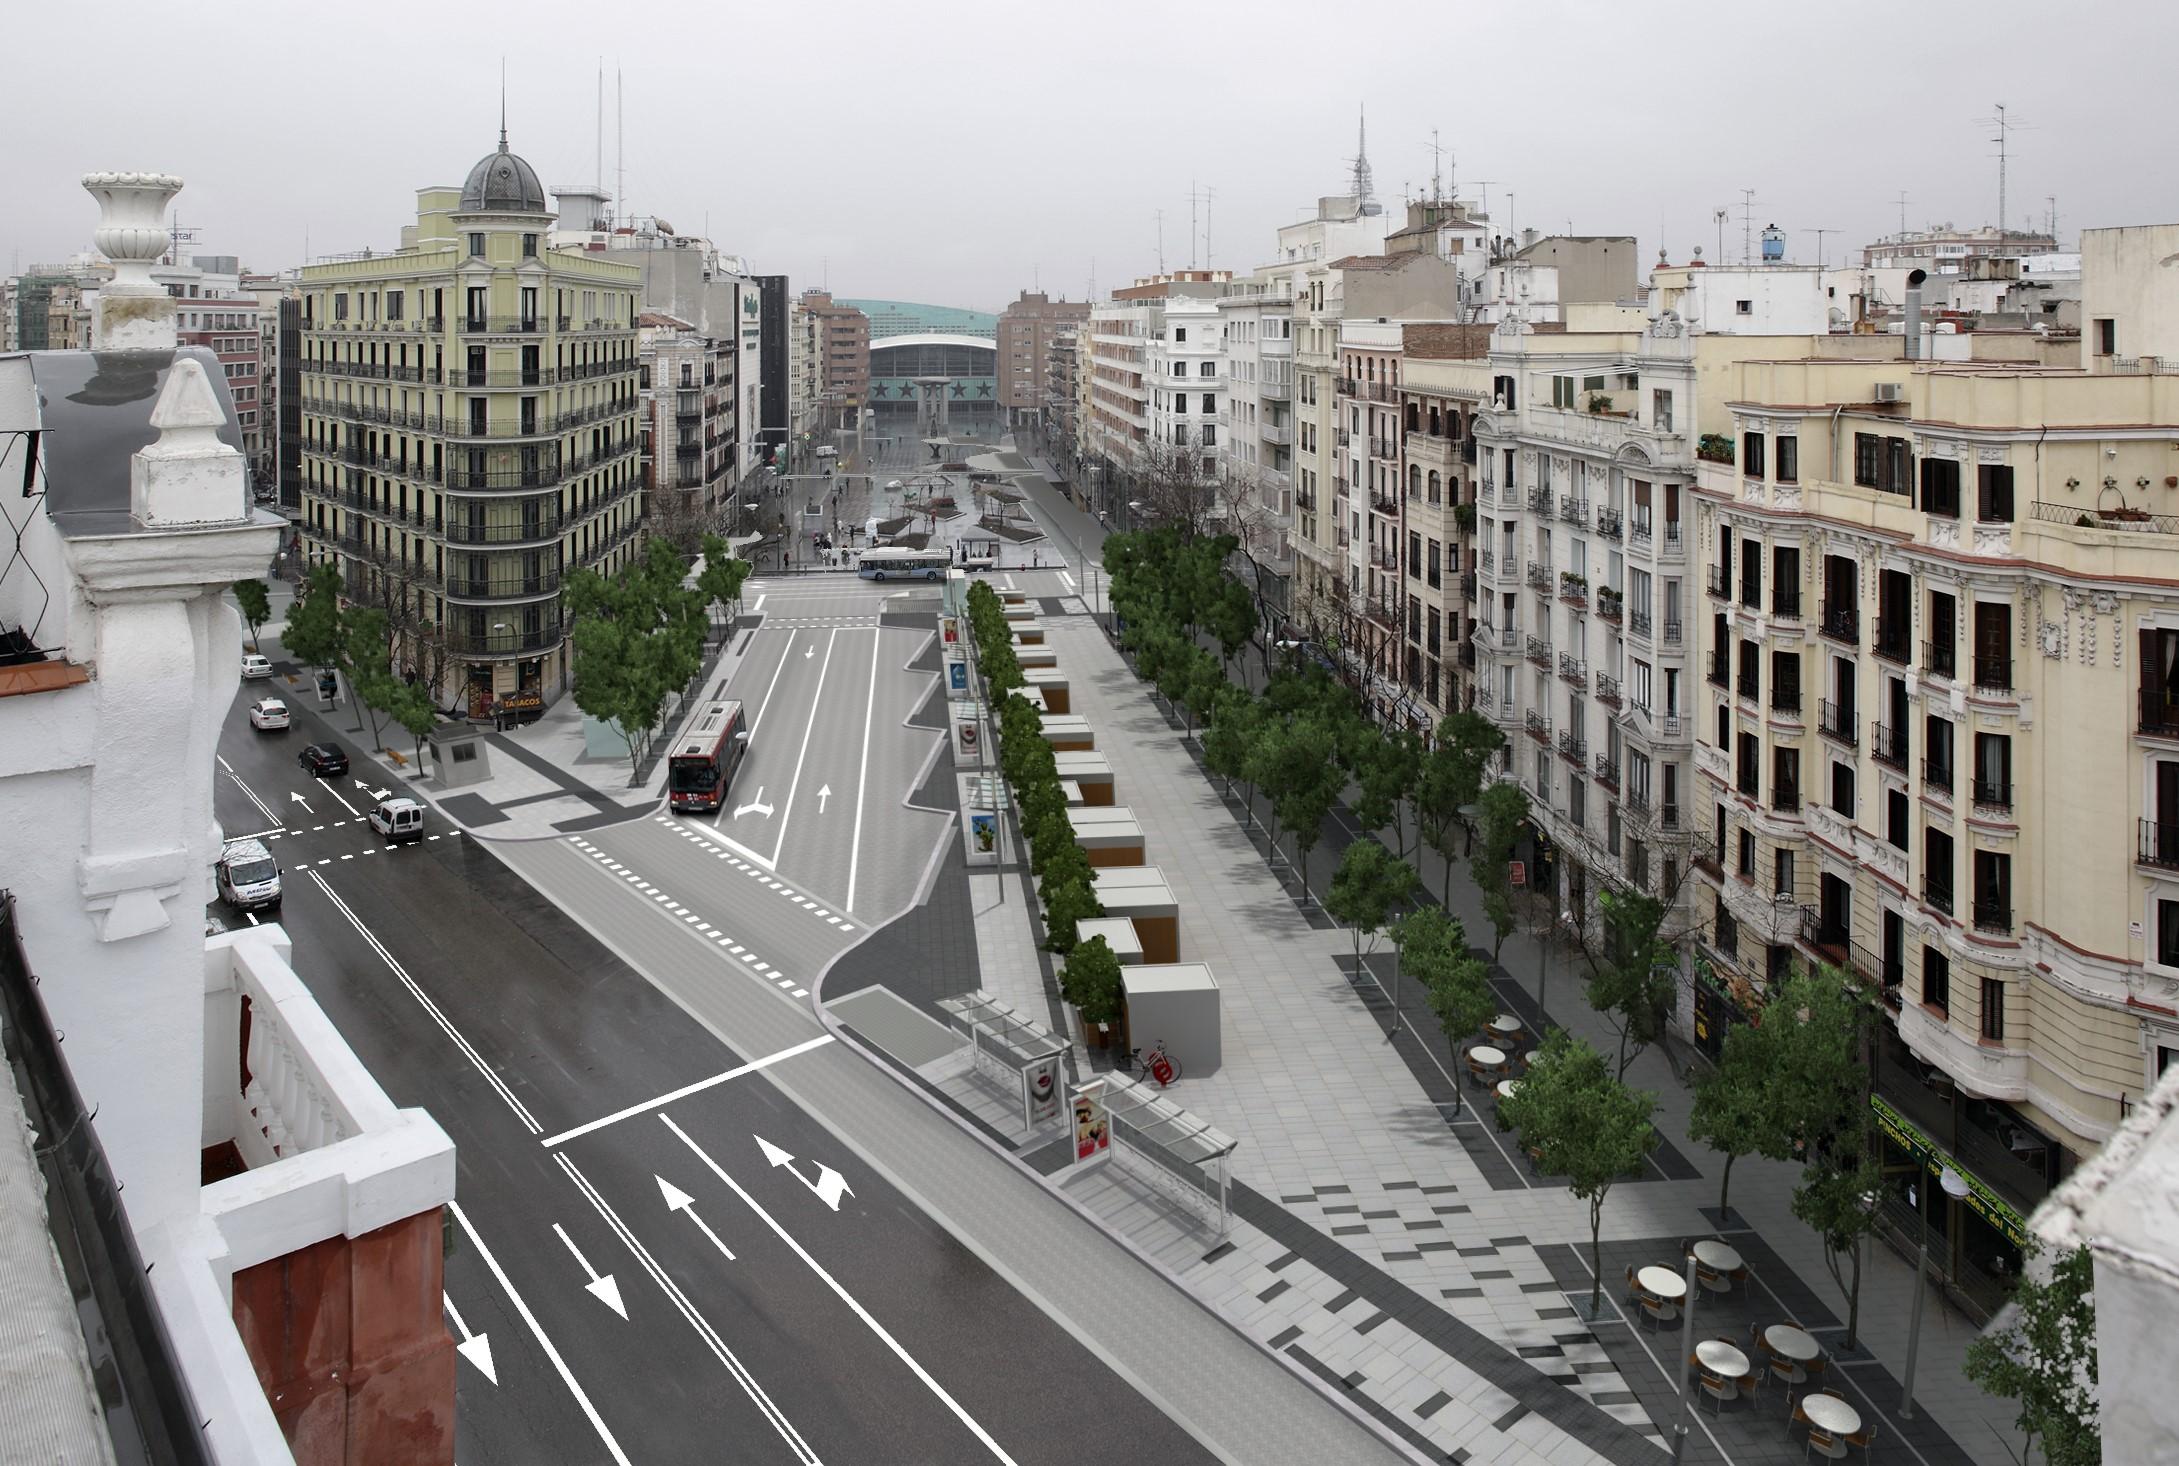 Avenida de Felipe II, Madrid